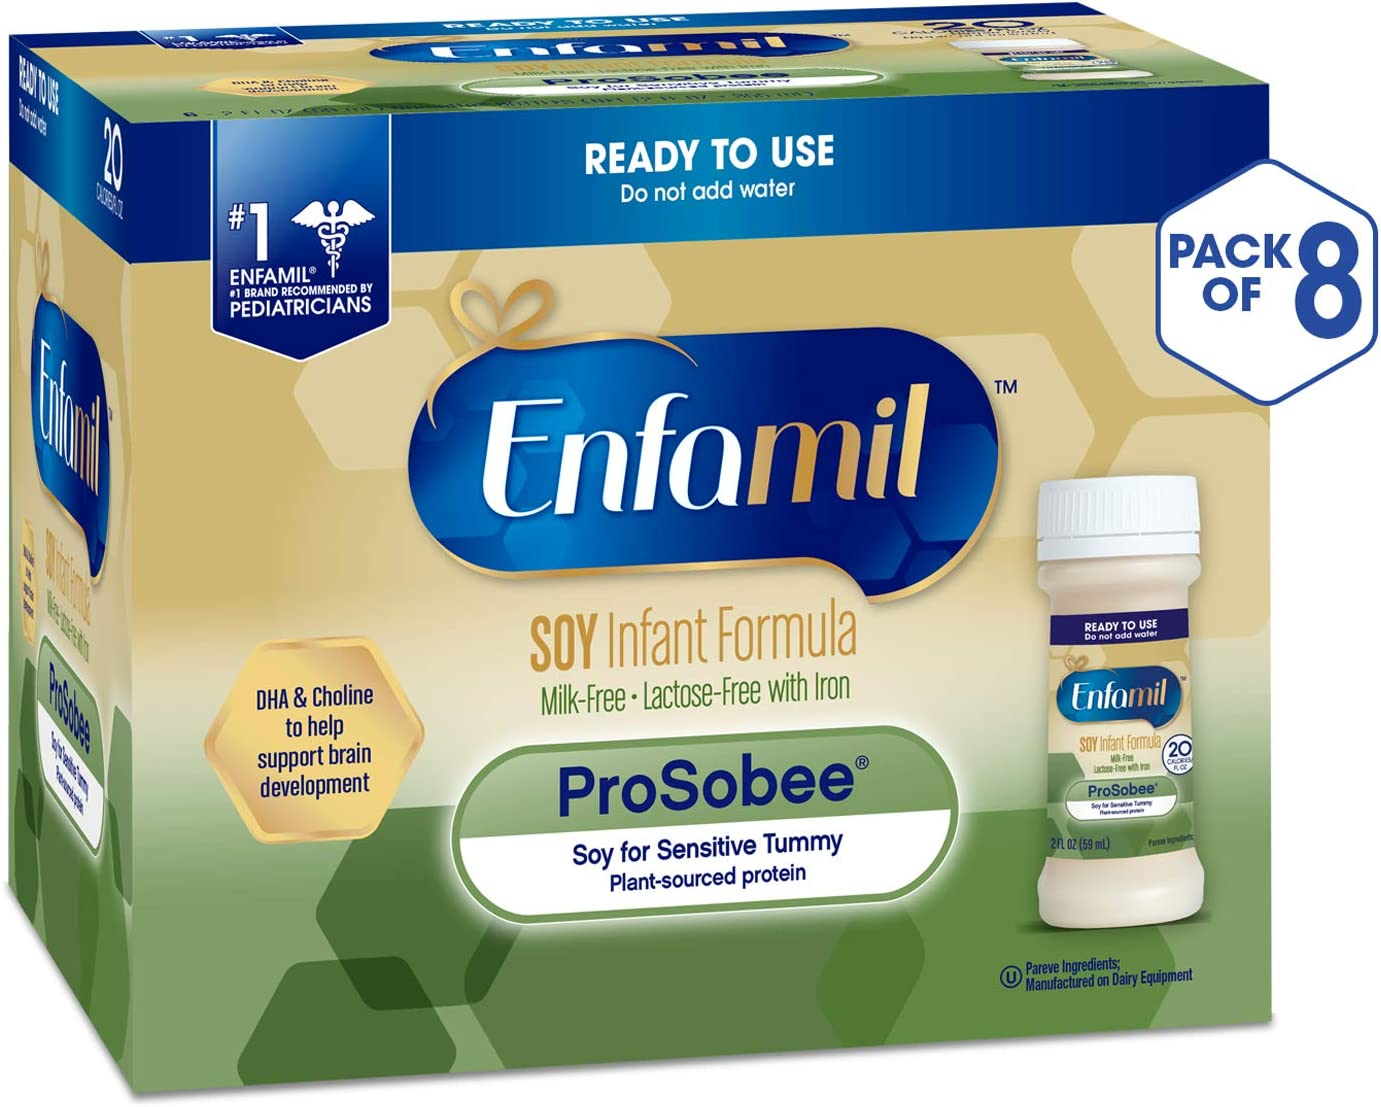 Enfamil ProSobee Soy Sensitive Tummy Baby Formula Dairy-Free Lactose-Free Milk-Free Plant Protein Ready to Use 2 fl. oz. bottles Nursette (48 bottles) Omega 3 DHA & Iron, Immune & Brain Support